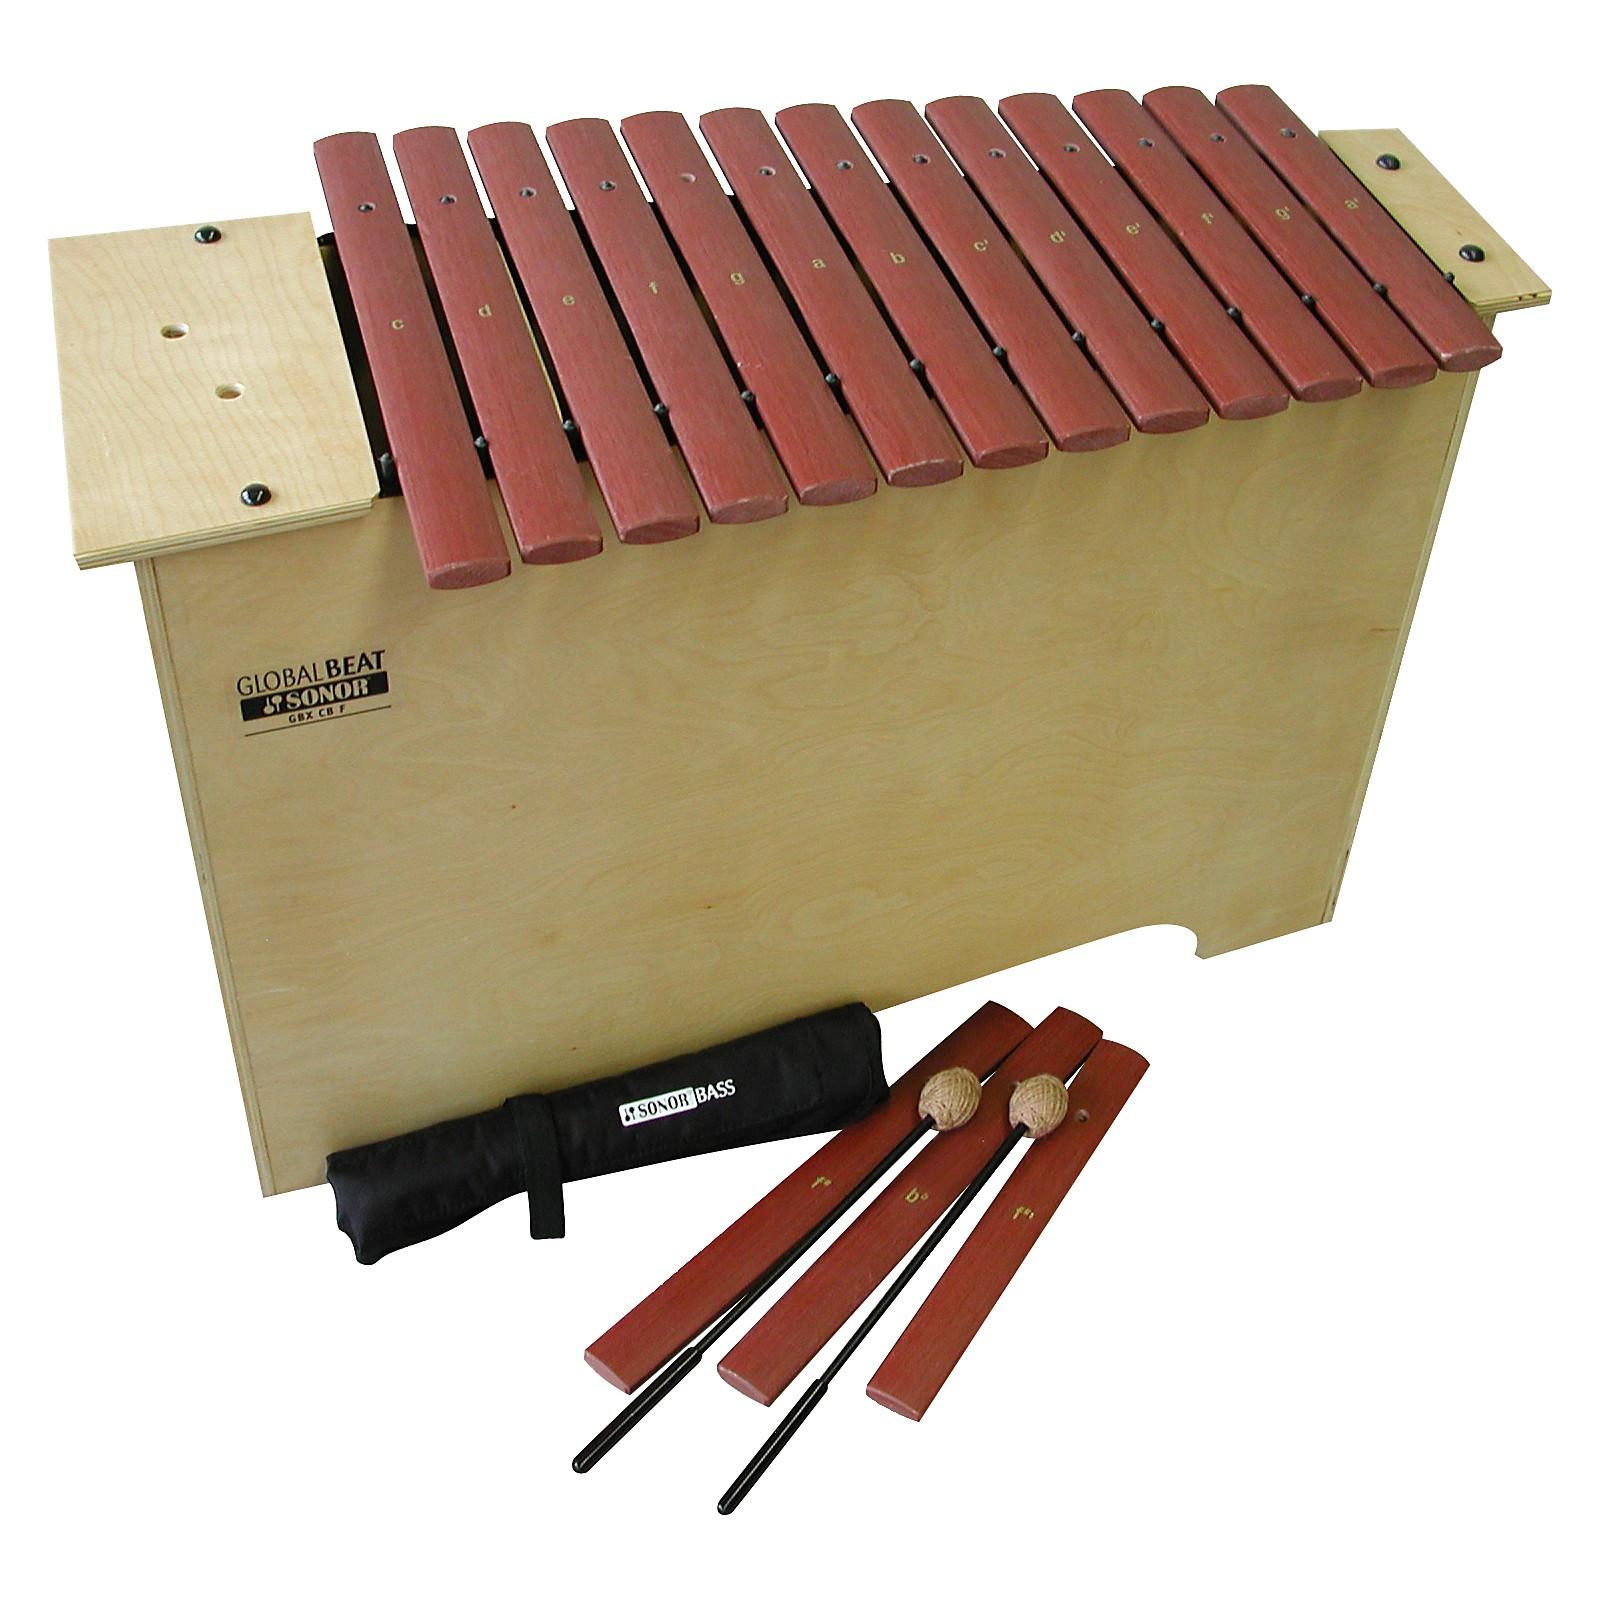 Sonor Orff Global Beat Deep Bass Xylophone with Fiberglass Bars